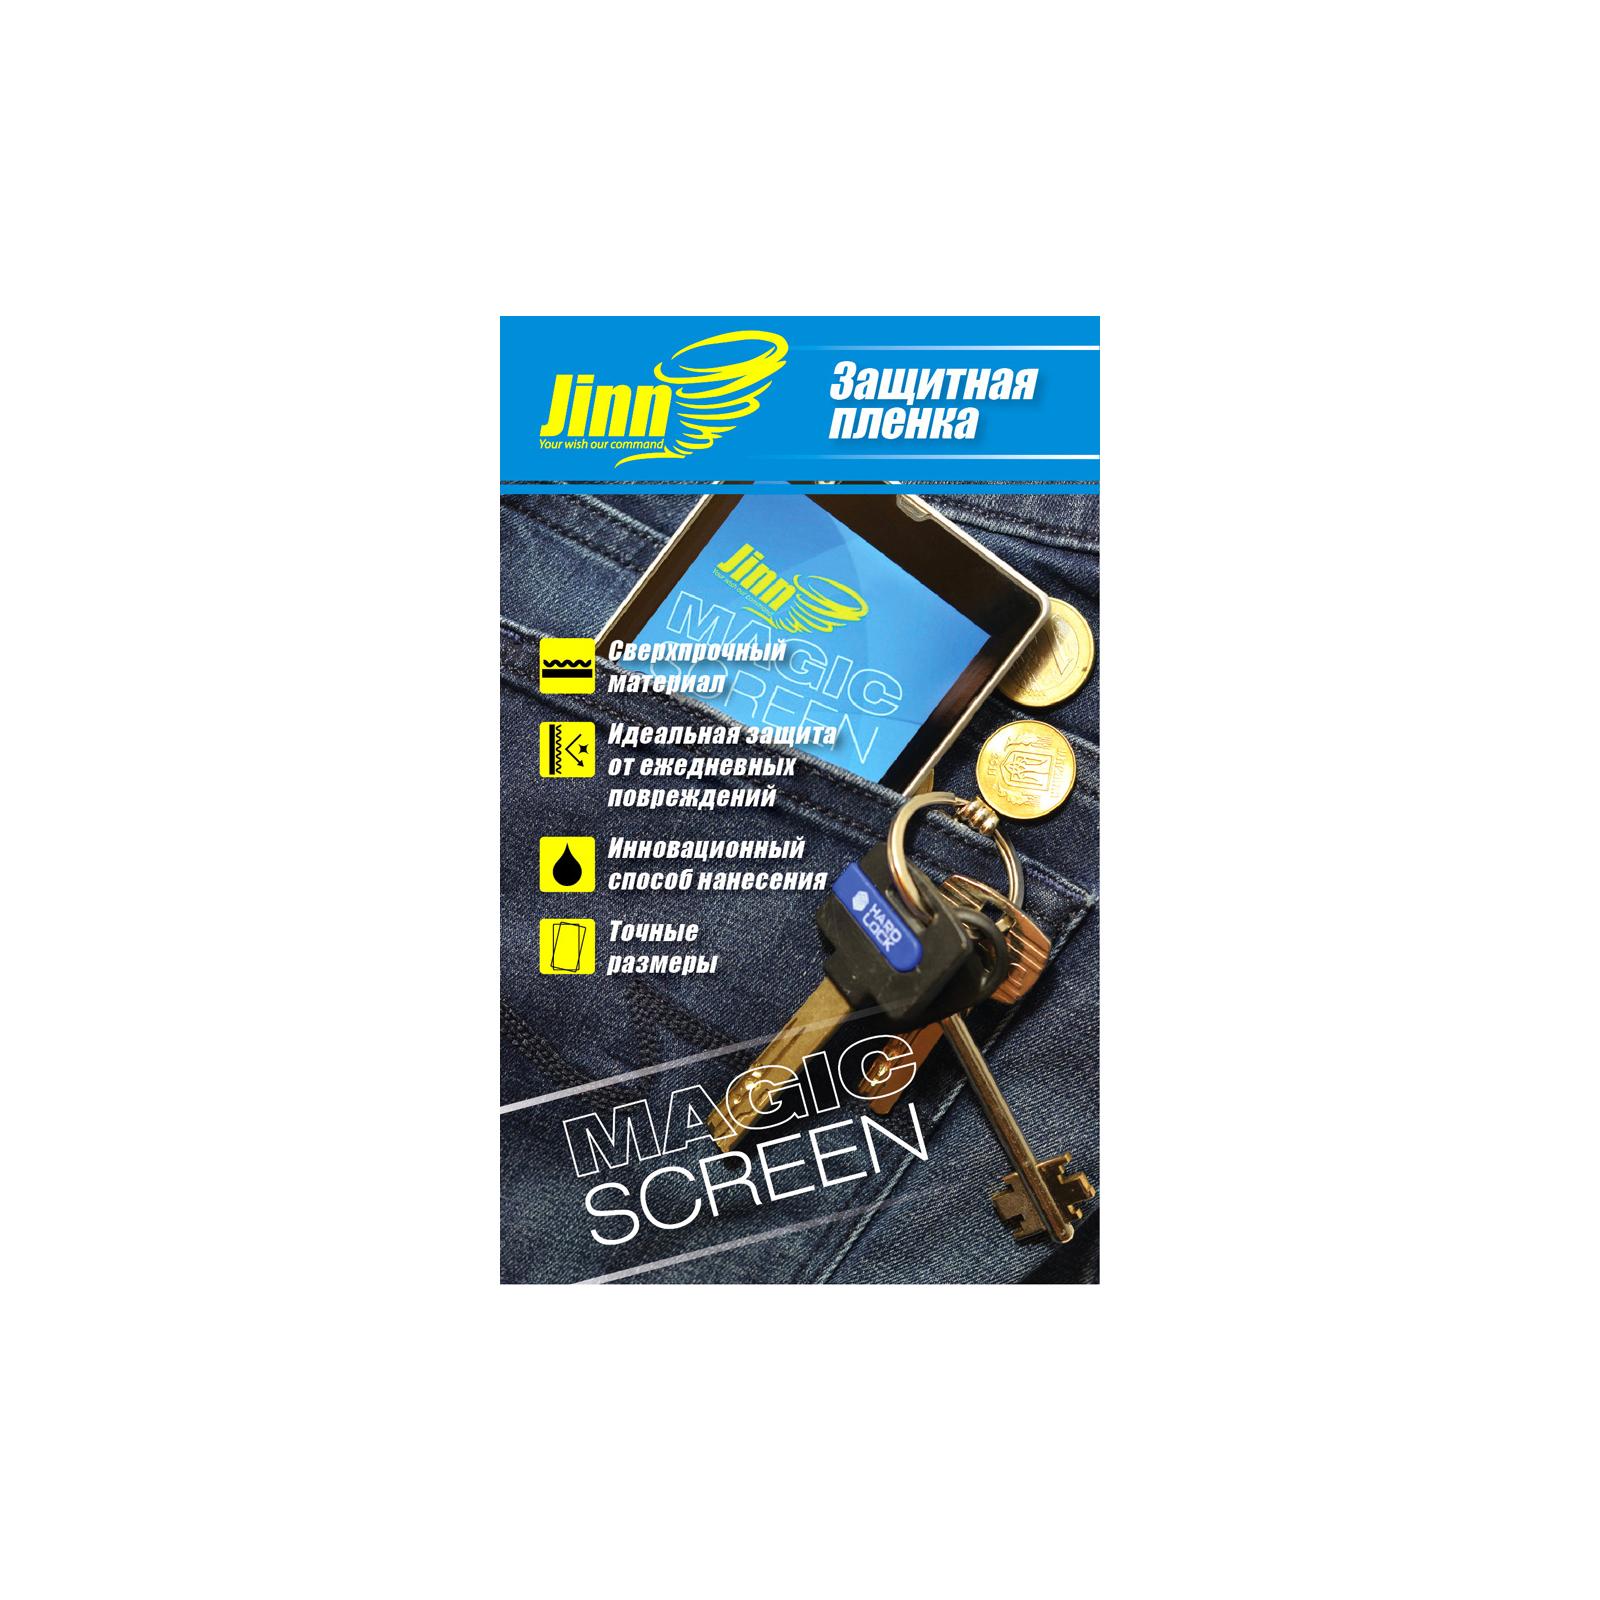 Пленка защитная JINN ультрапрочная Magic Screen для Lenovo IdeaPhone S930 (Lenovo IdeaPhone S930 front)